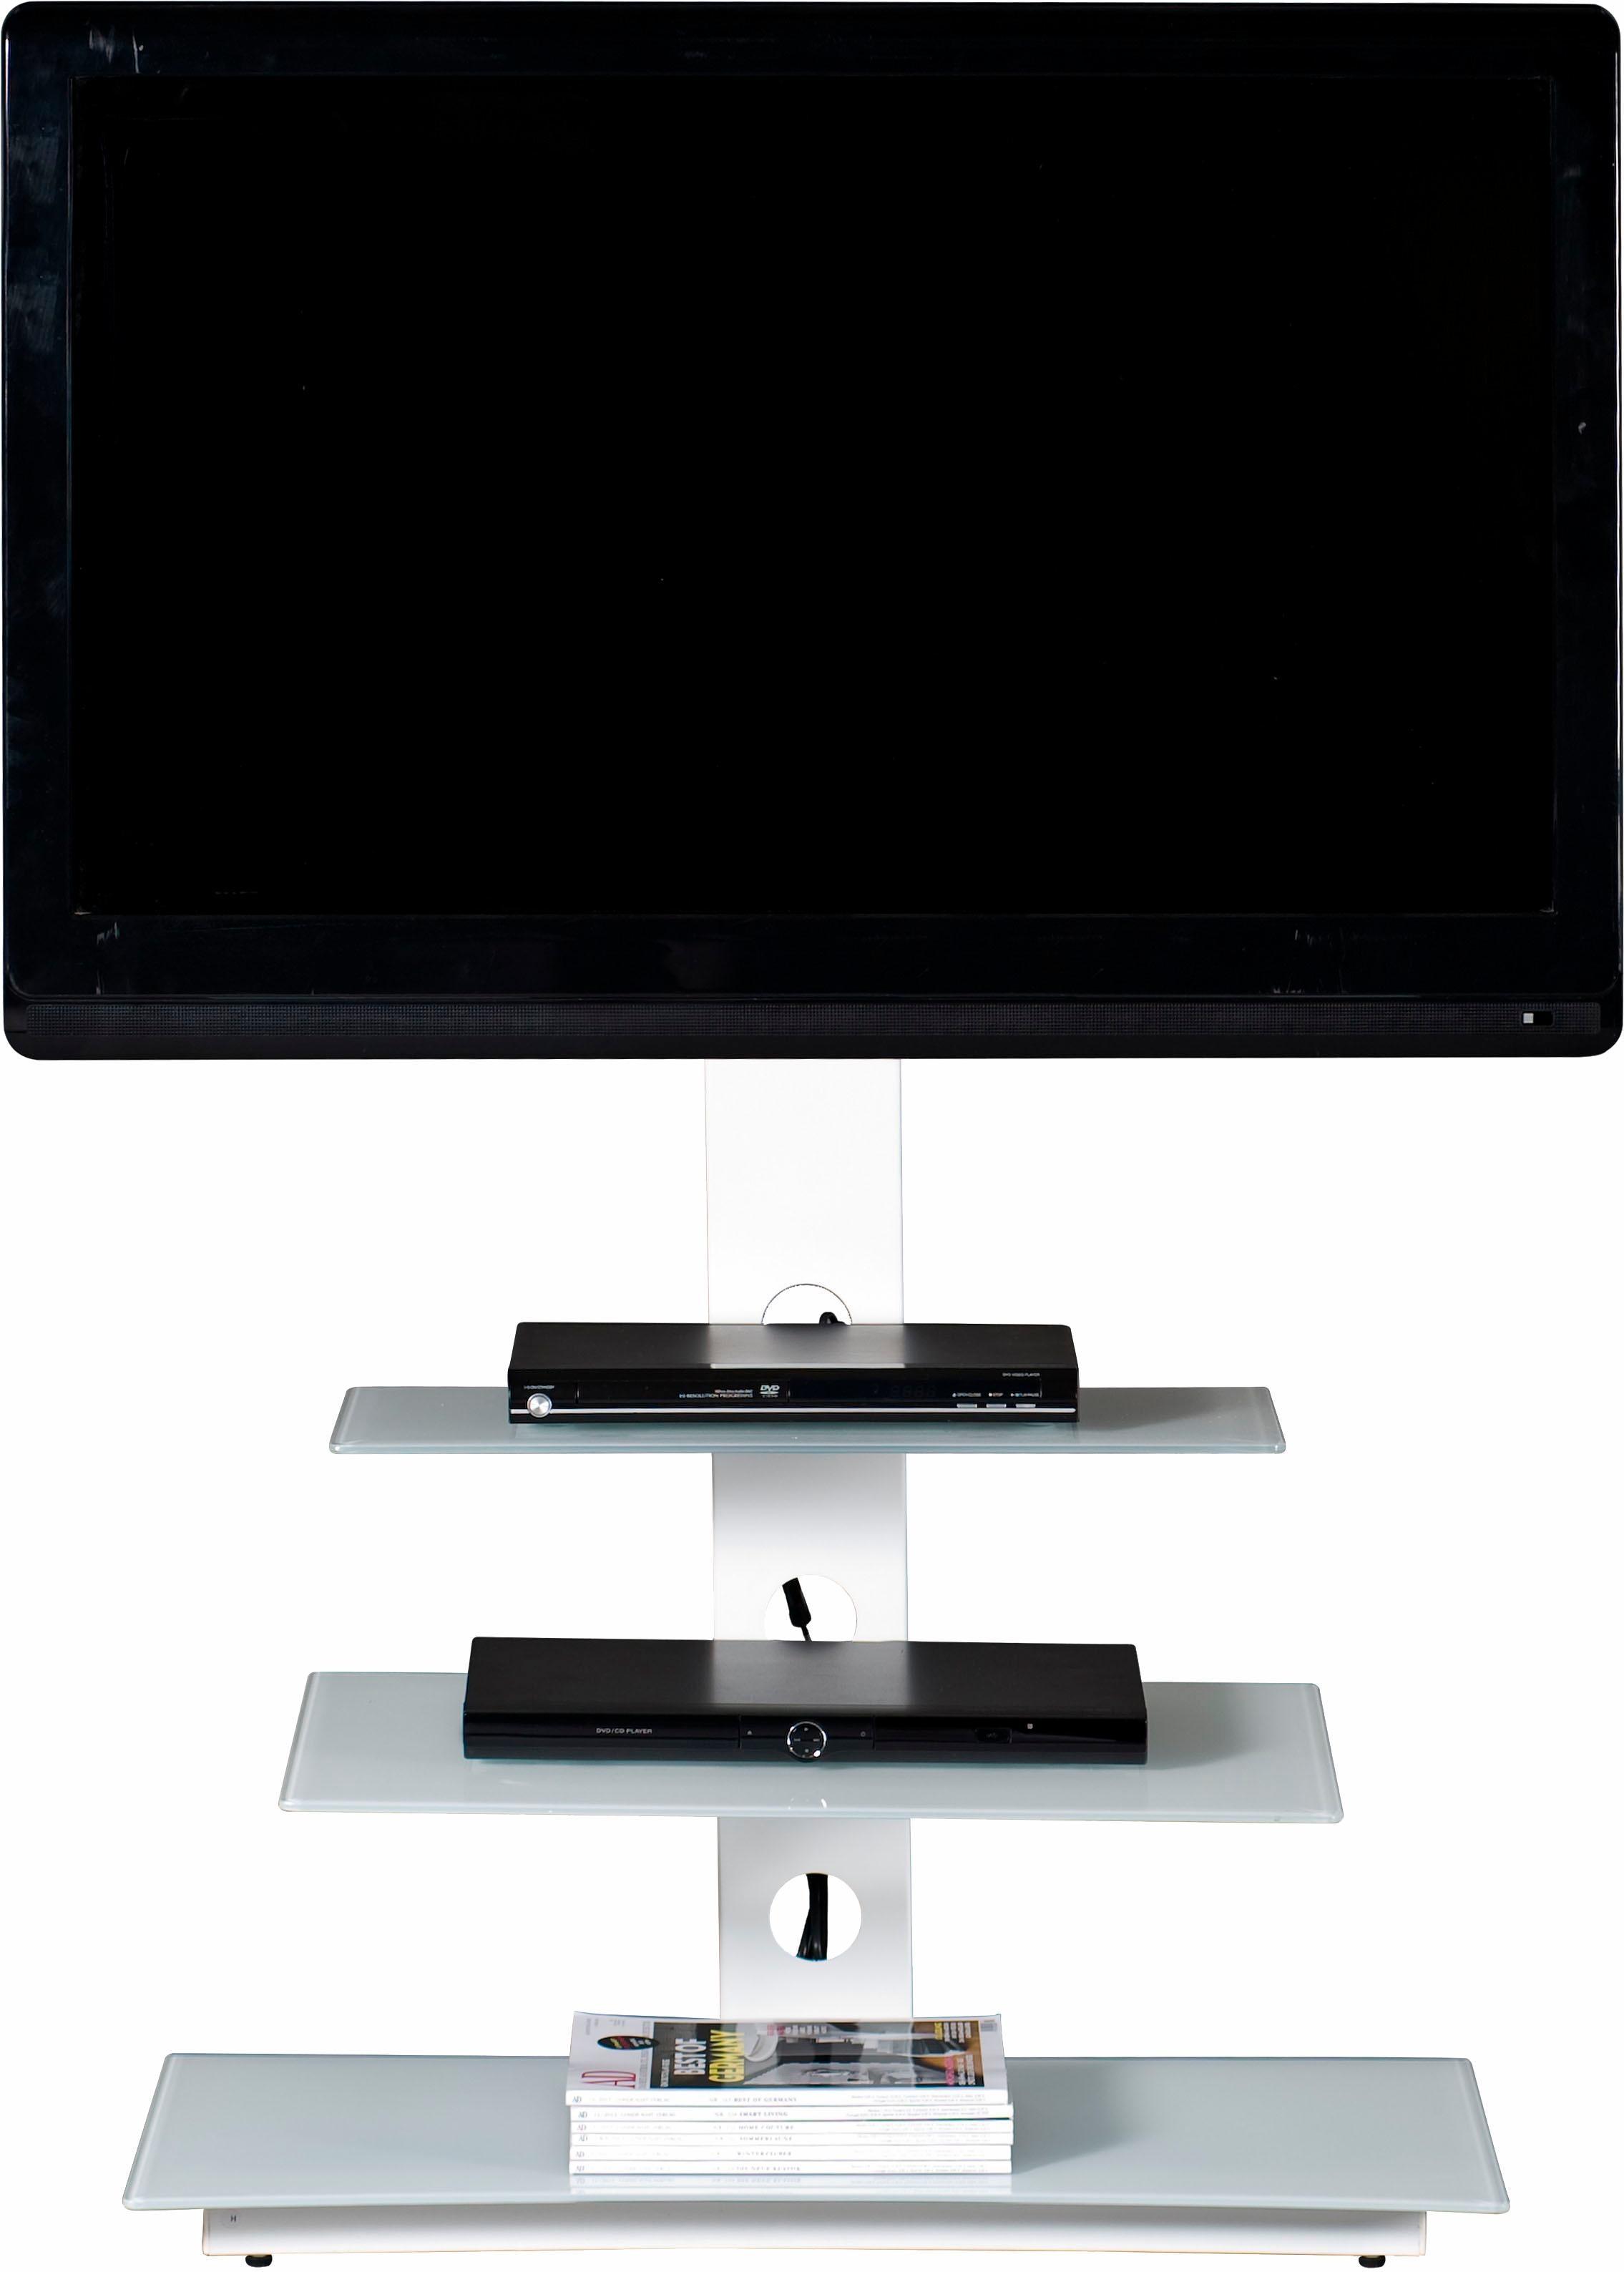 jahnke tv mobel Bildquelle: Cuuba by Jahnke LCD TV-Möbel, Breite 86 cm